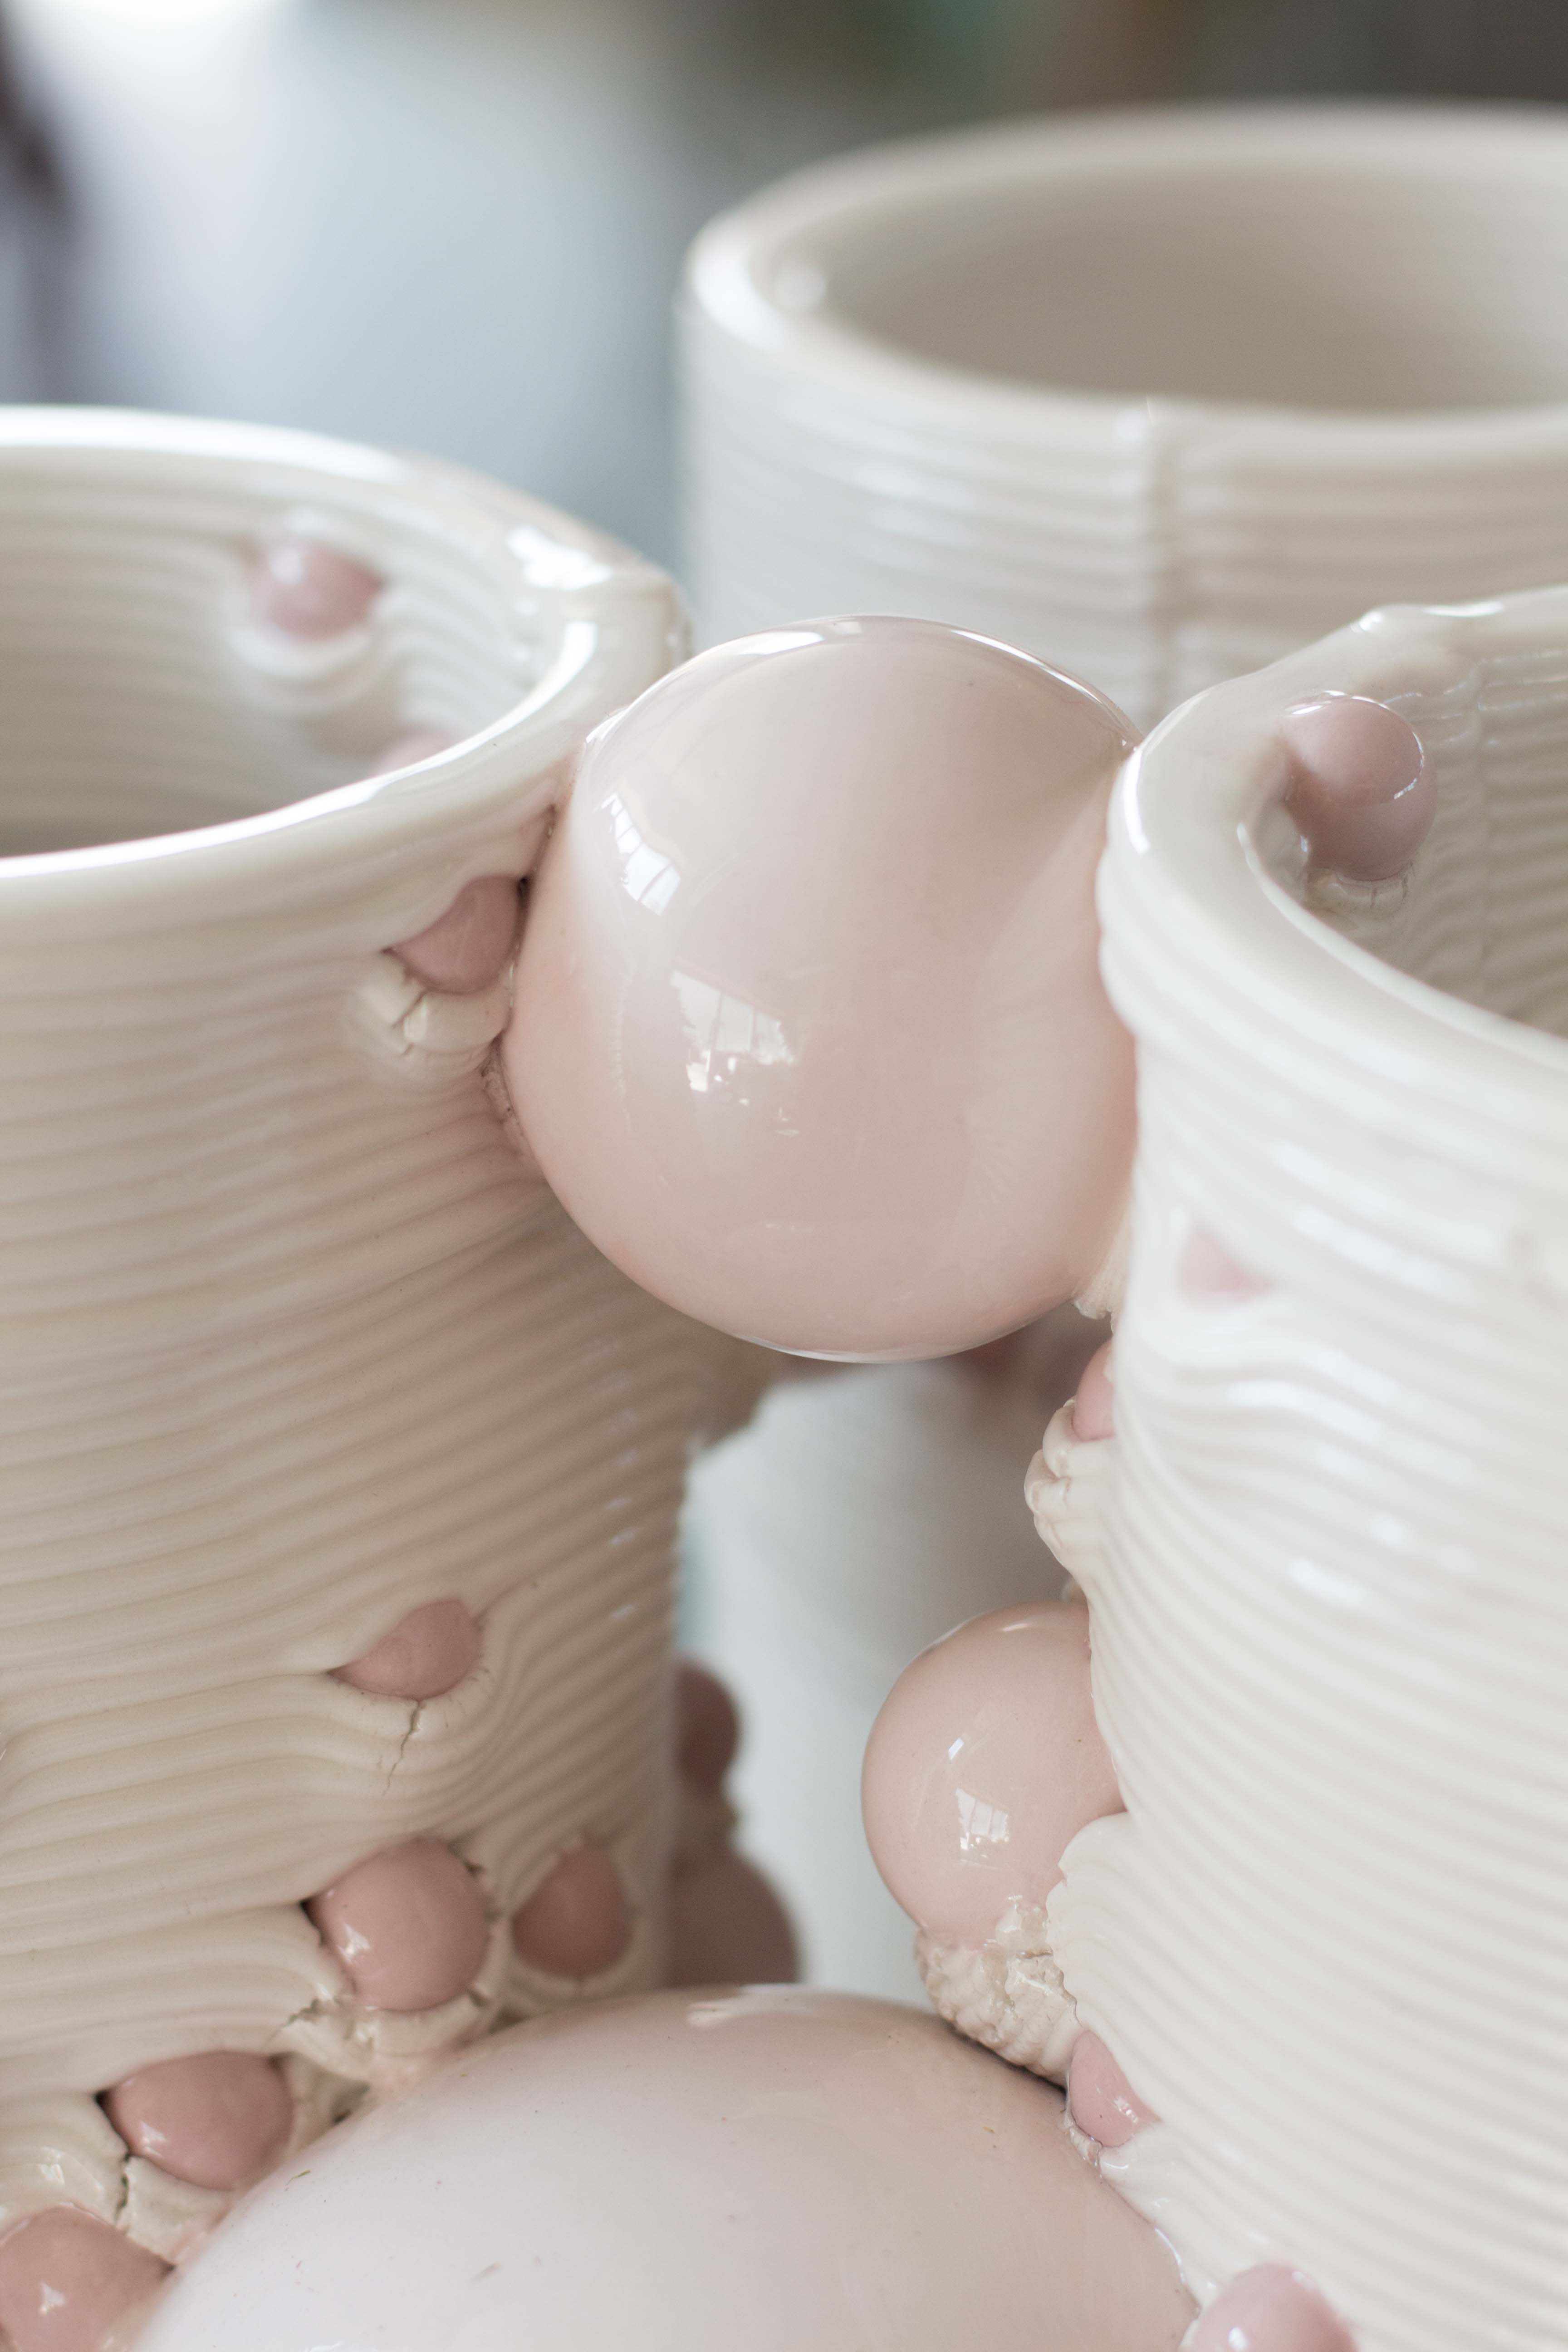 3D printed ikebana vases. Photo via WASP.